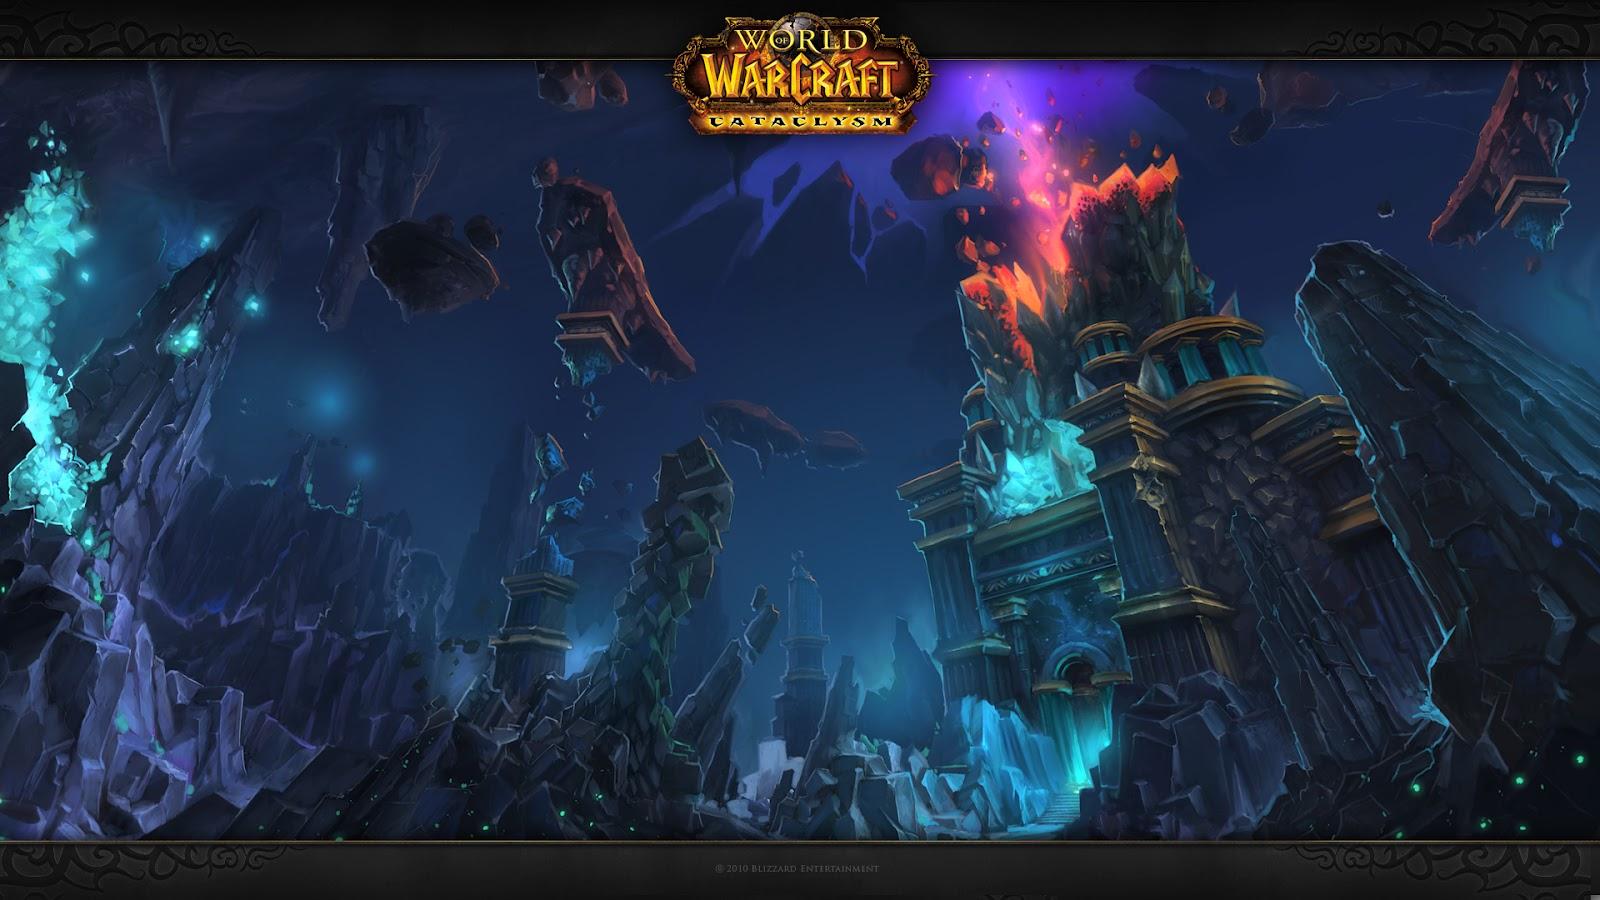 http://1.bp.blogspot.com/-FESJcVfoJa8/UA6p9qZJZOI/AAAAAAAAA3Q/M9rHqGv267k/s1600/World+of+Warcraft+wallpapers++deepholm-1920x1080.jpg